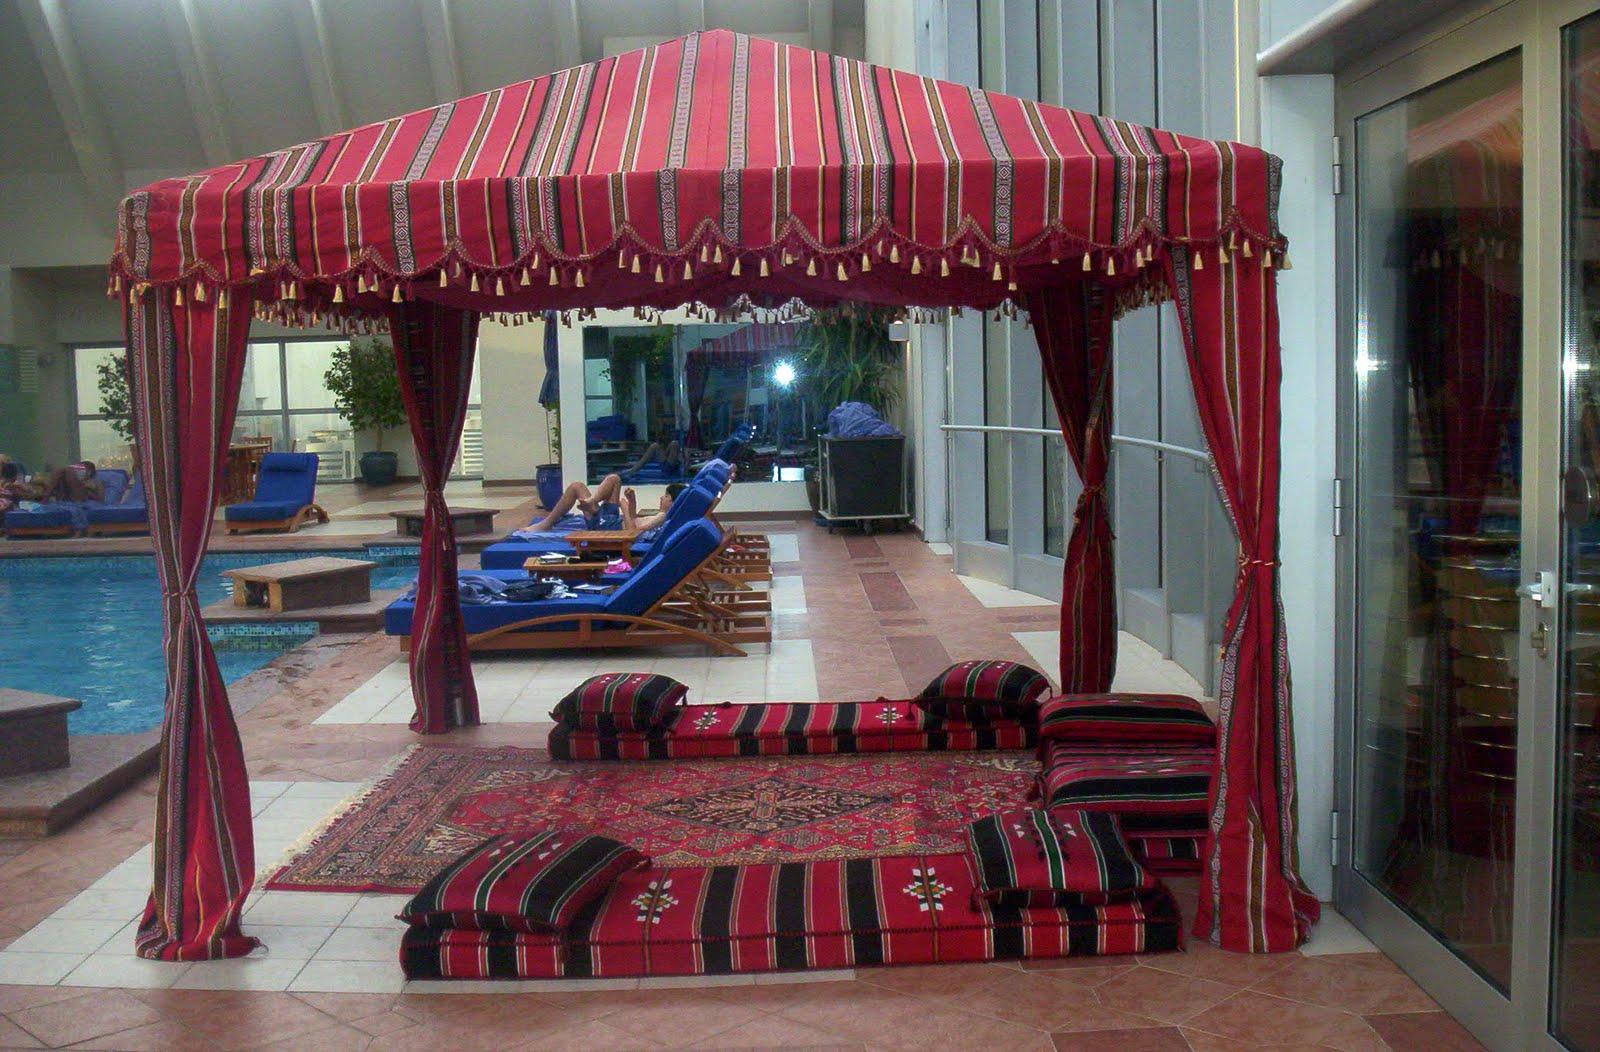 Ramadaarabian seatingsn majlis